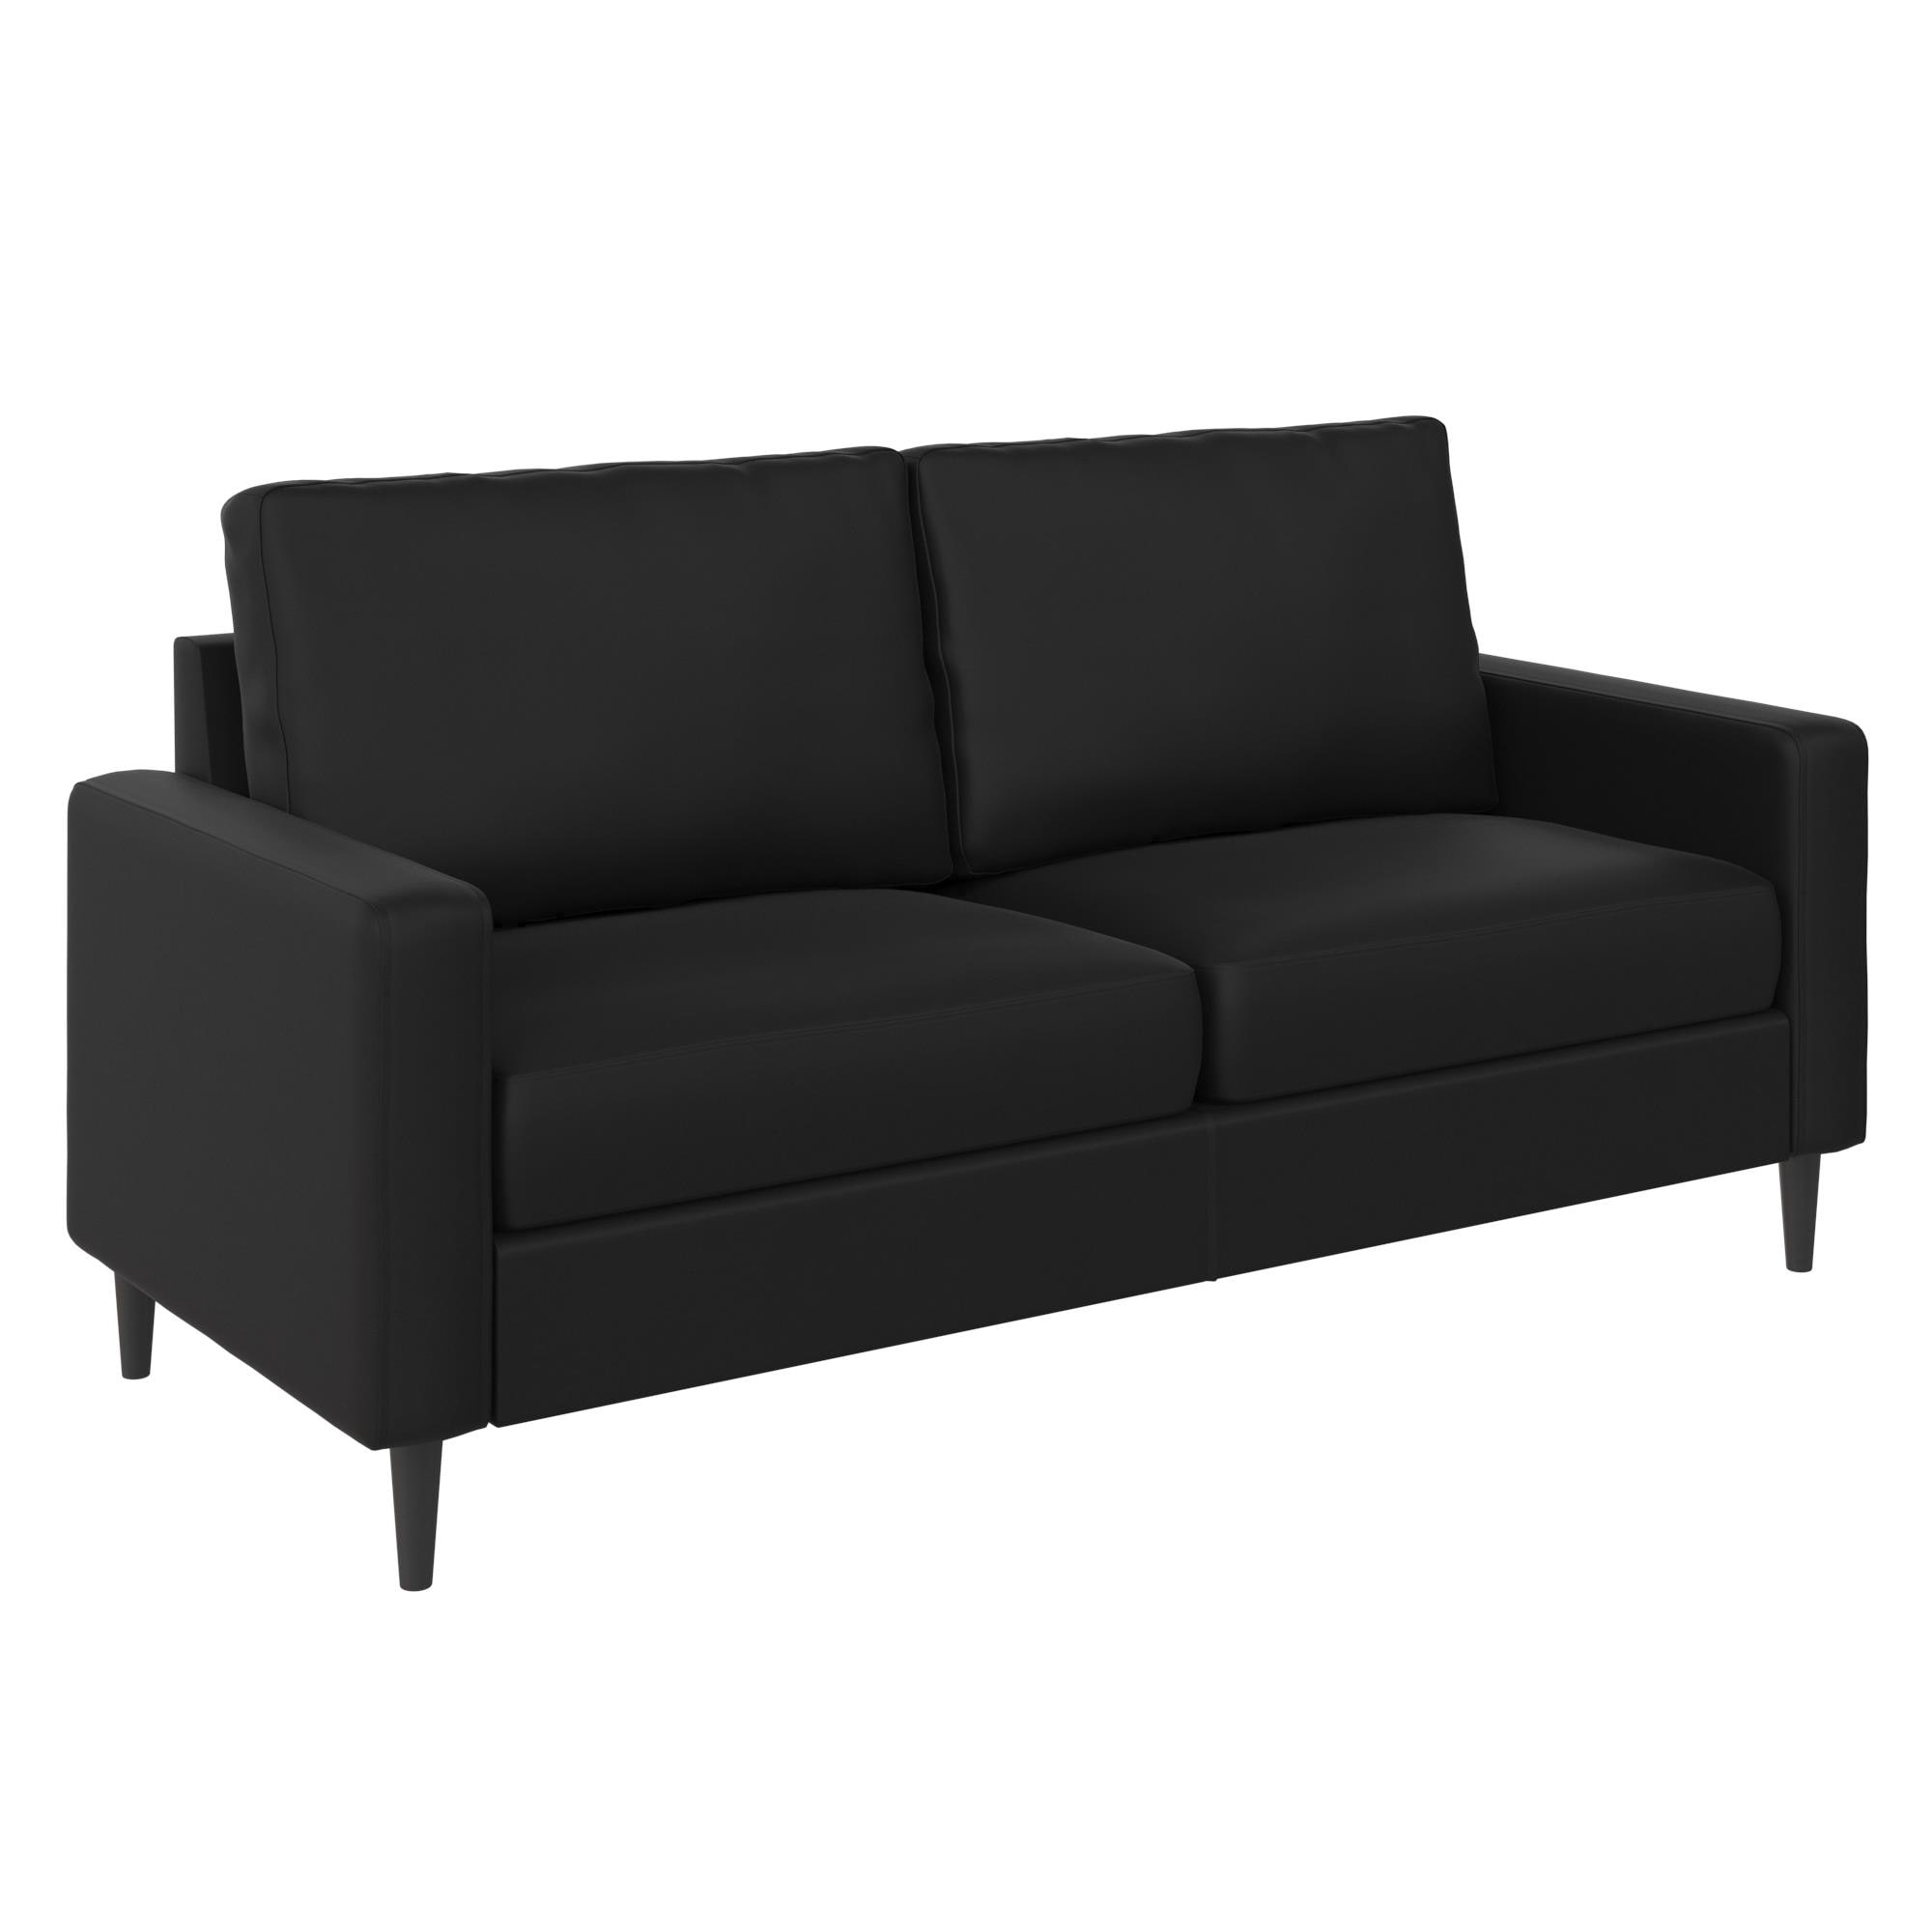 Avenue Greene Hadrian Modern Sofa -  DO02451